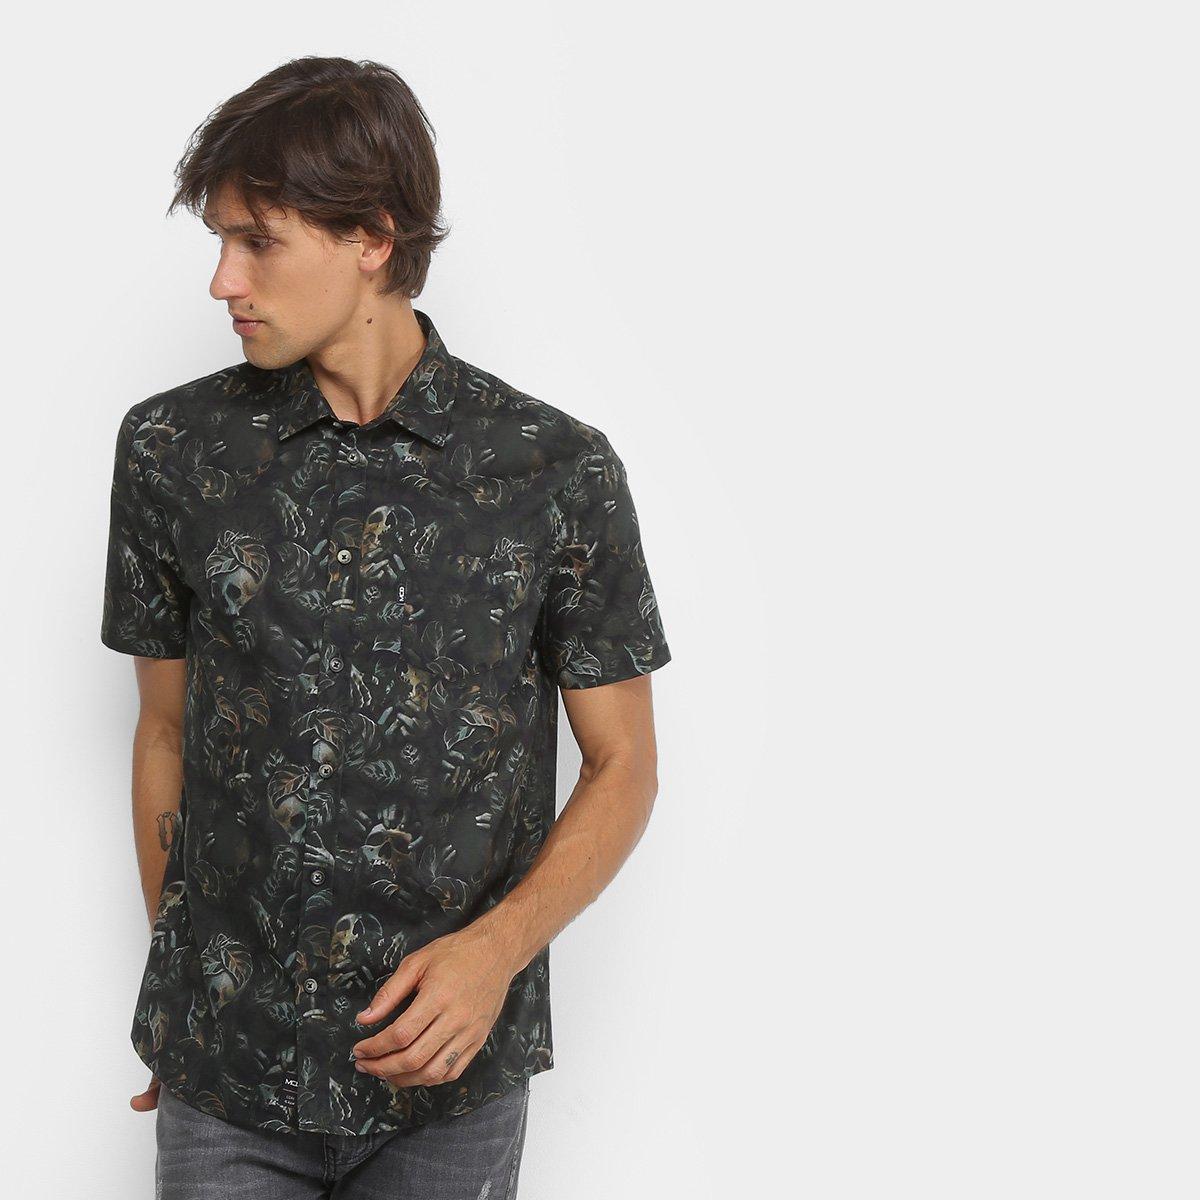 390dfabc4 Camisa MCD Manga Curta Estampada Masculina